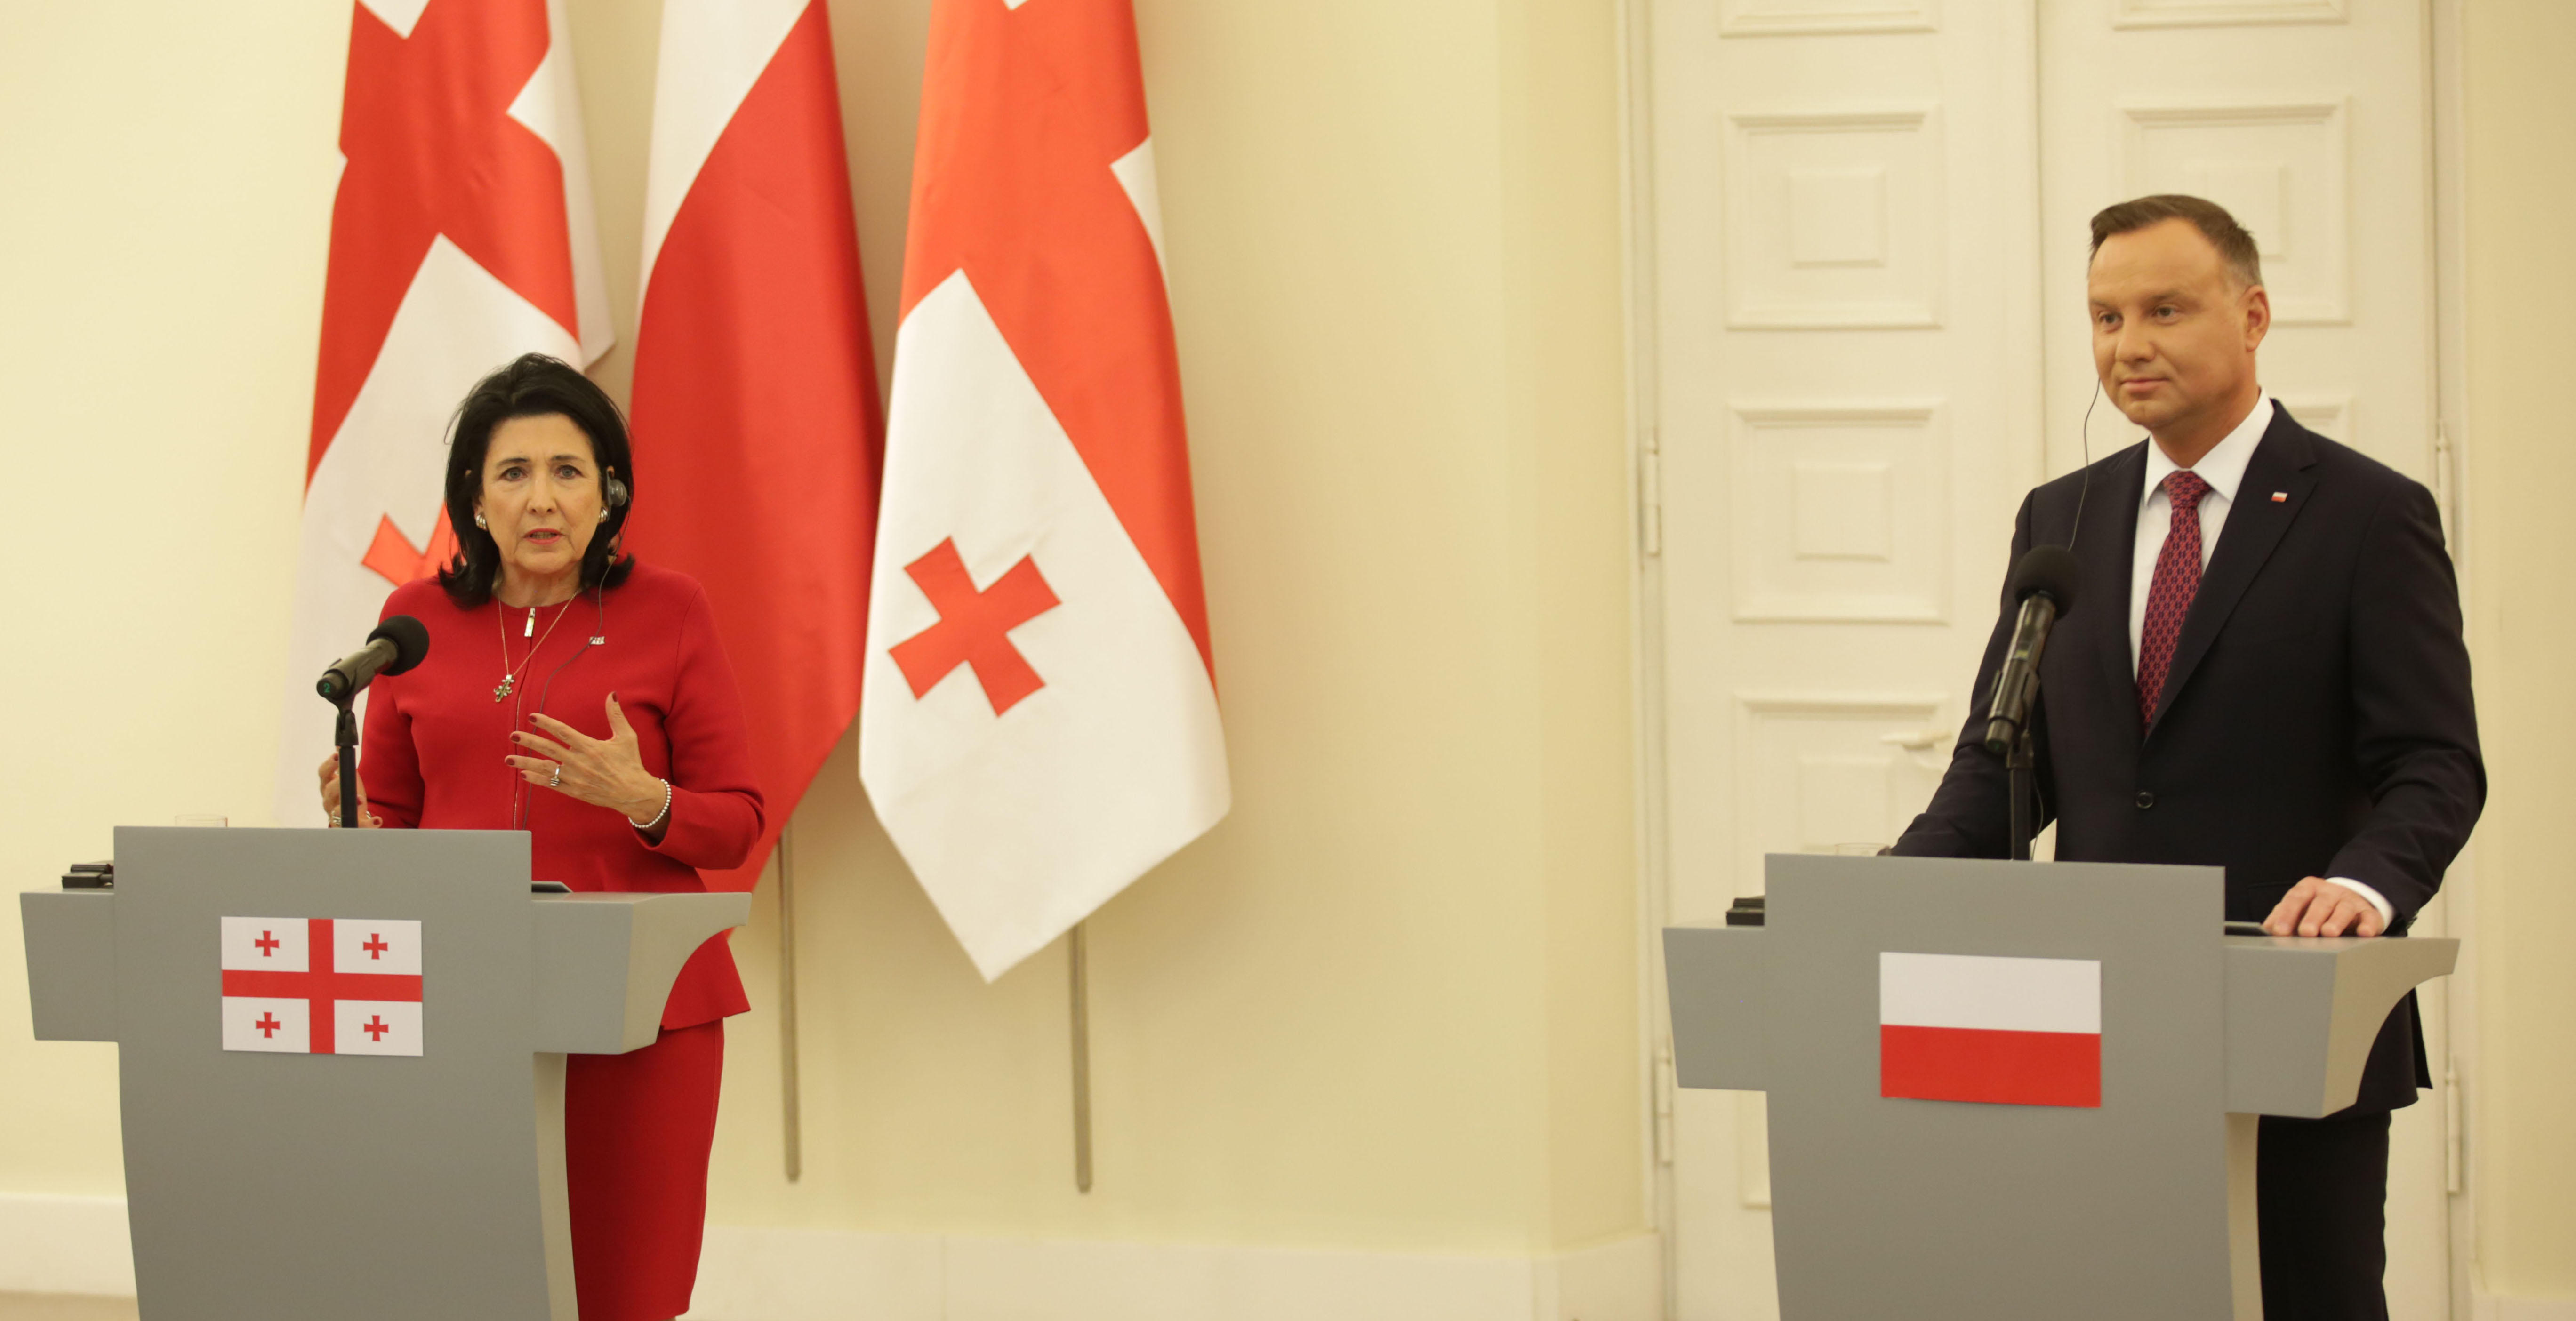 [X] Rzeczpospolita Polska Dudazurabishvili